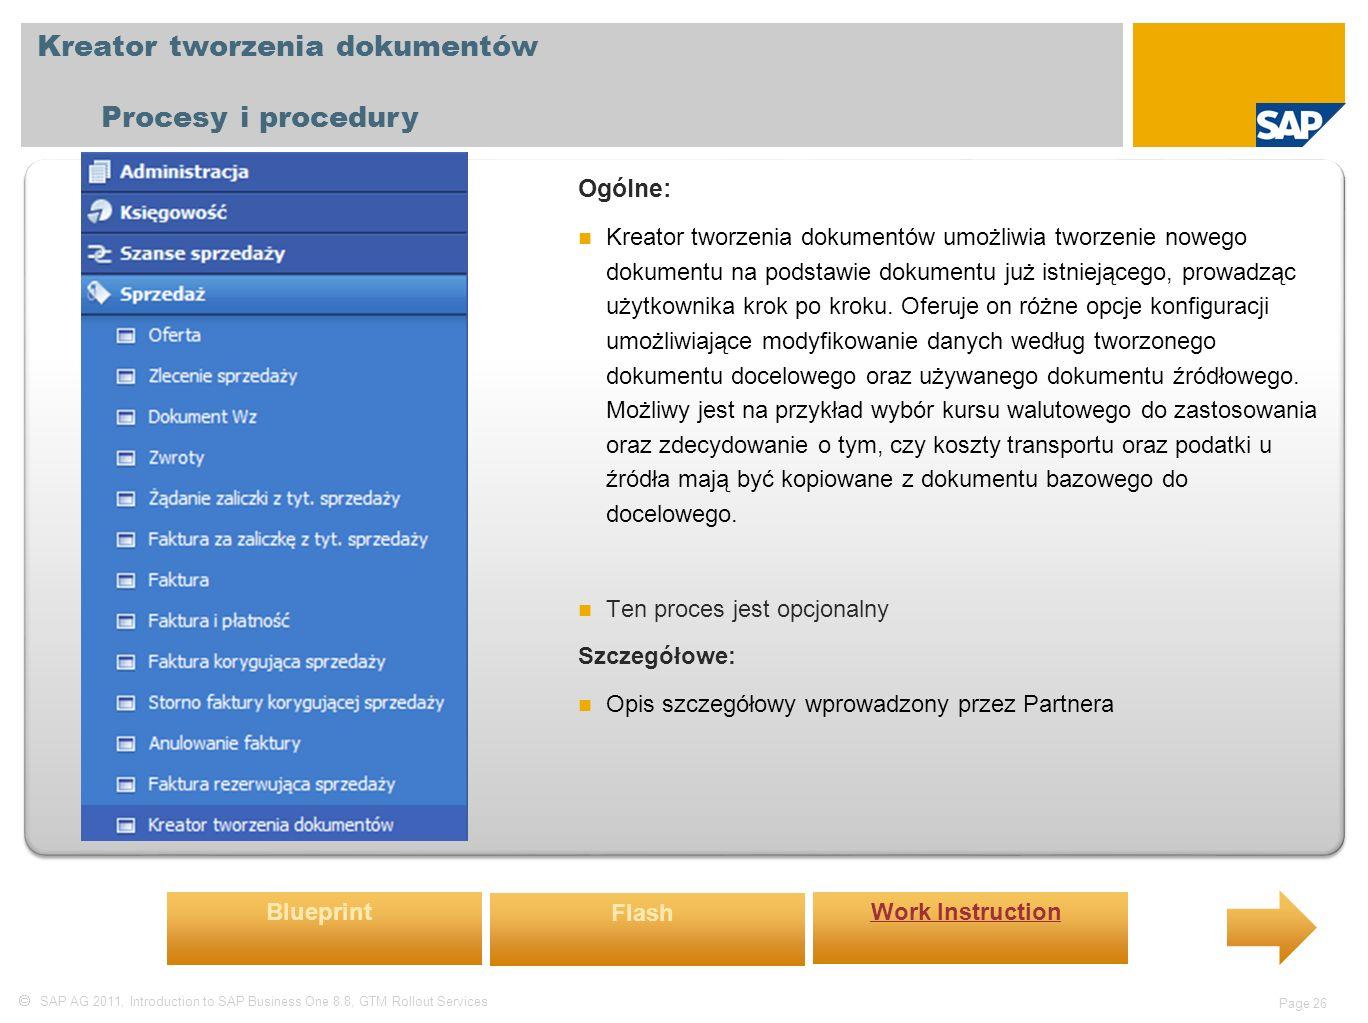  SAP AG 2011, Introduction to SAP Business One 8.8, GTM Rollout Services Page 26 Kreator tworzenia dokumentów Procesy i procedury Ogólne: Kreator two